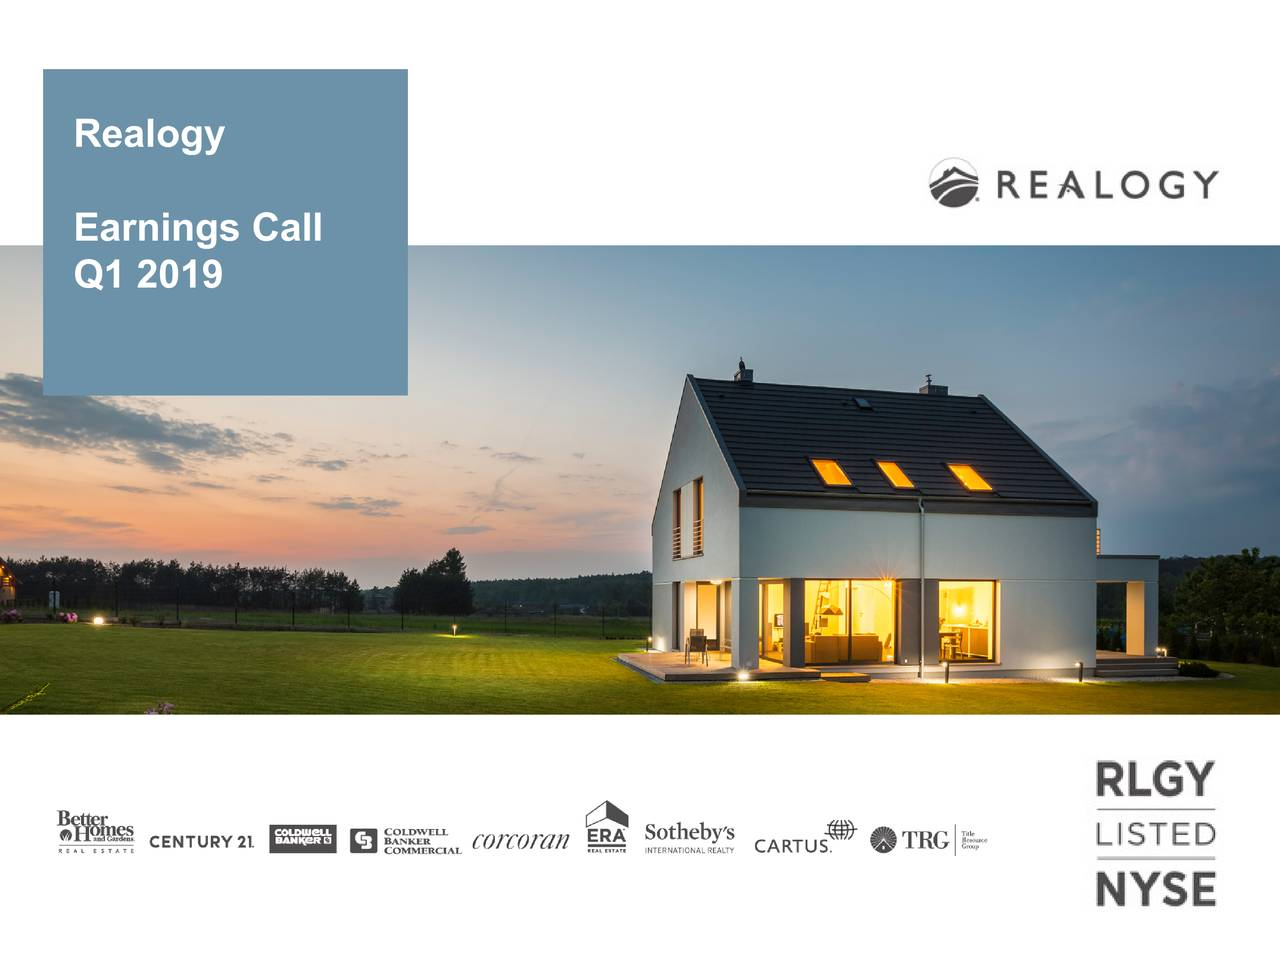 Earnings Call Q1 2019